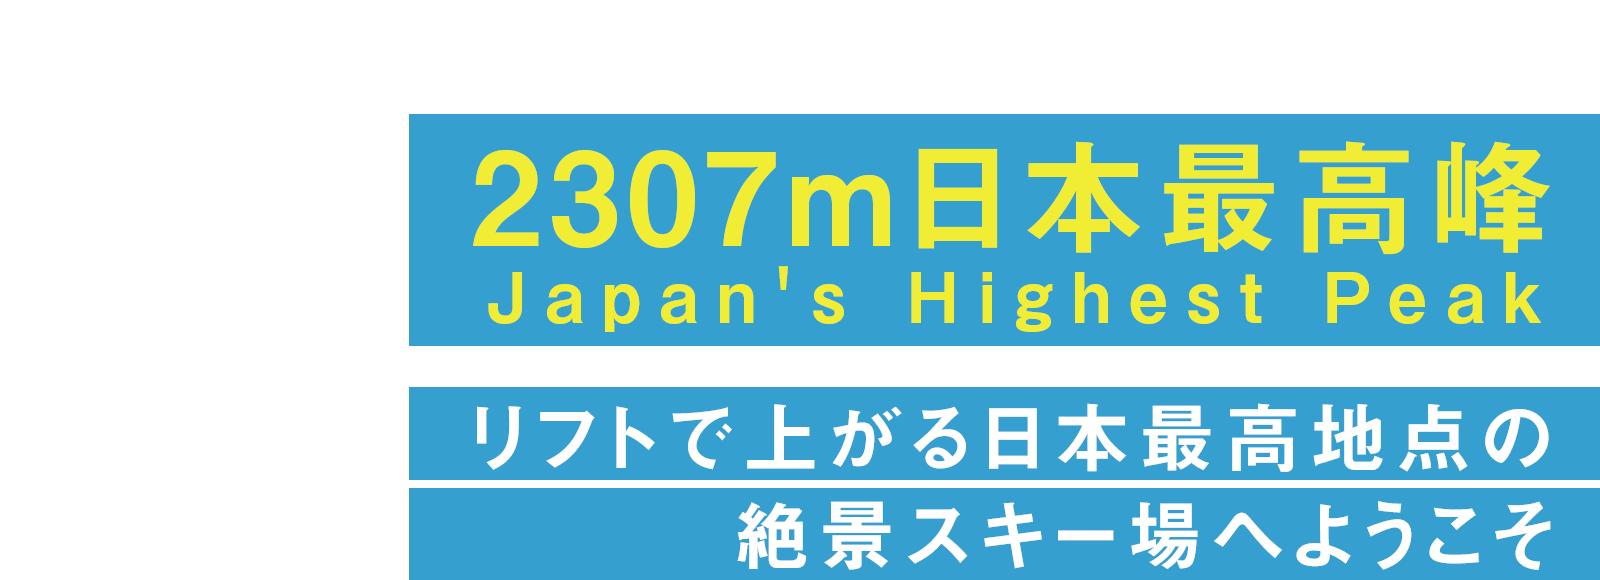 2307m日本最高峰 Japan's Highest Peak リフトで上がる日本最高地点の 絶景スキー場へようこそ